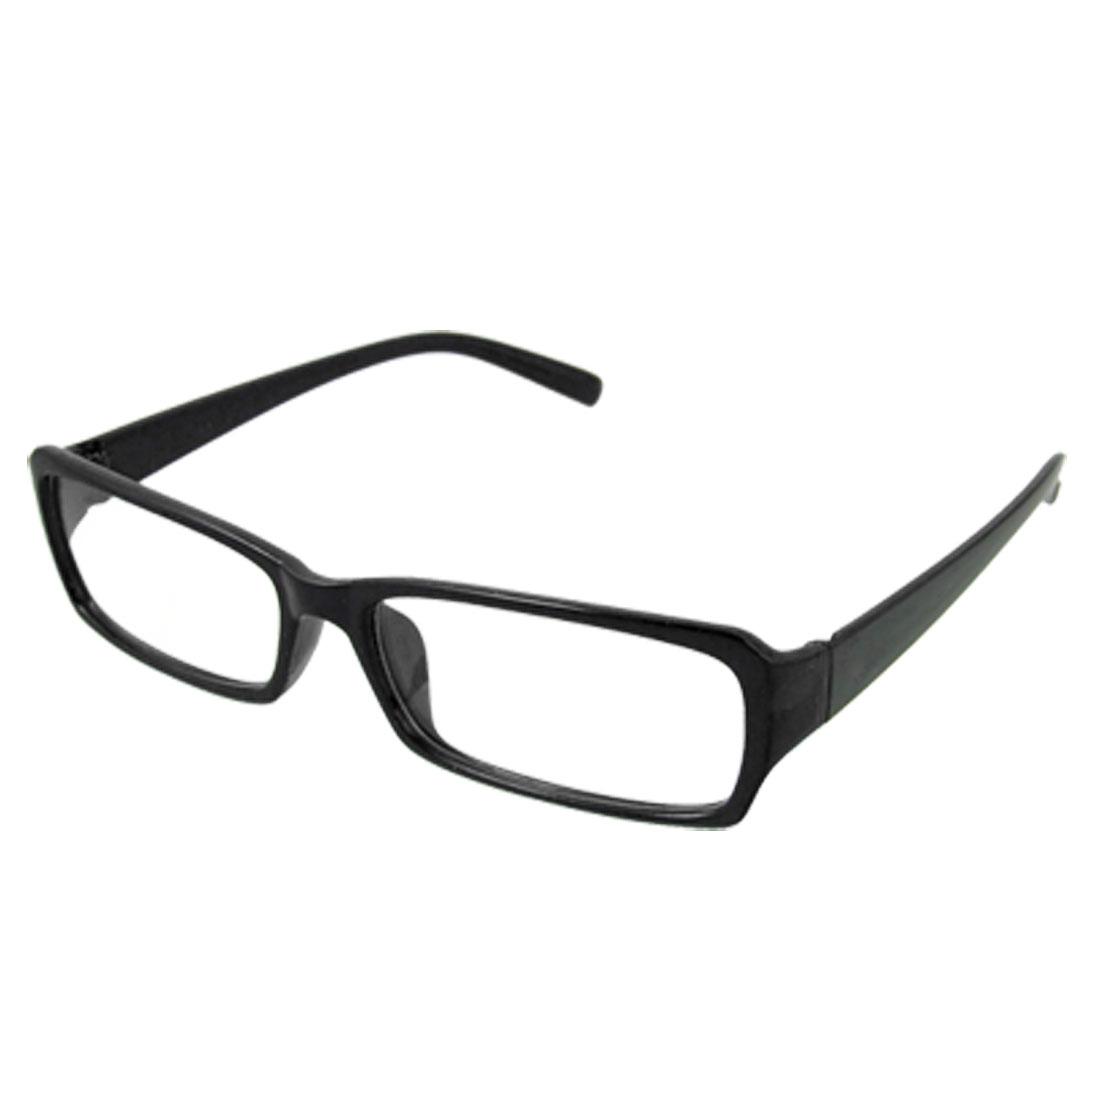 Black Frame Rimmed Plastic Arms Clear Lens Plano Glasses for Unisex